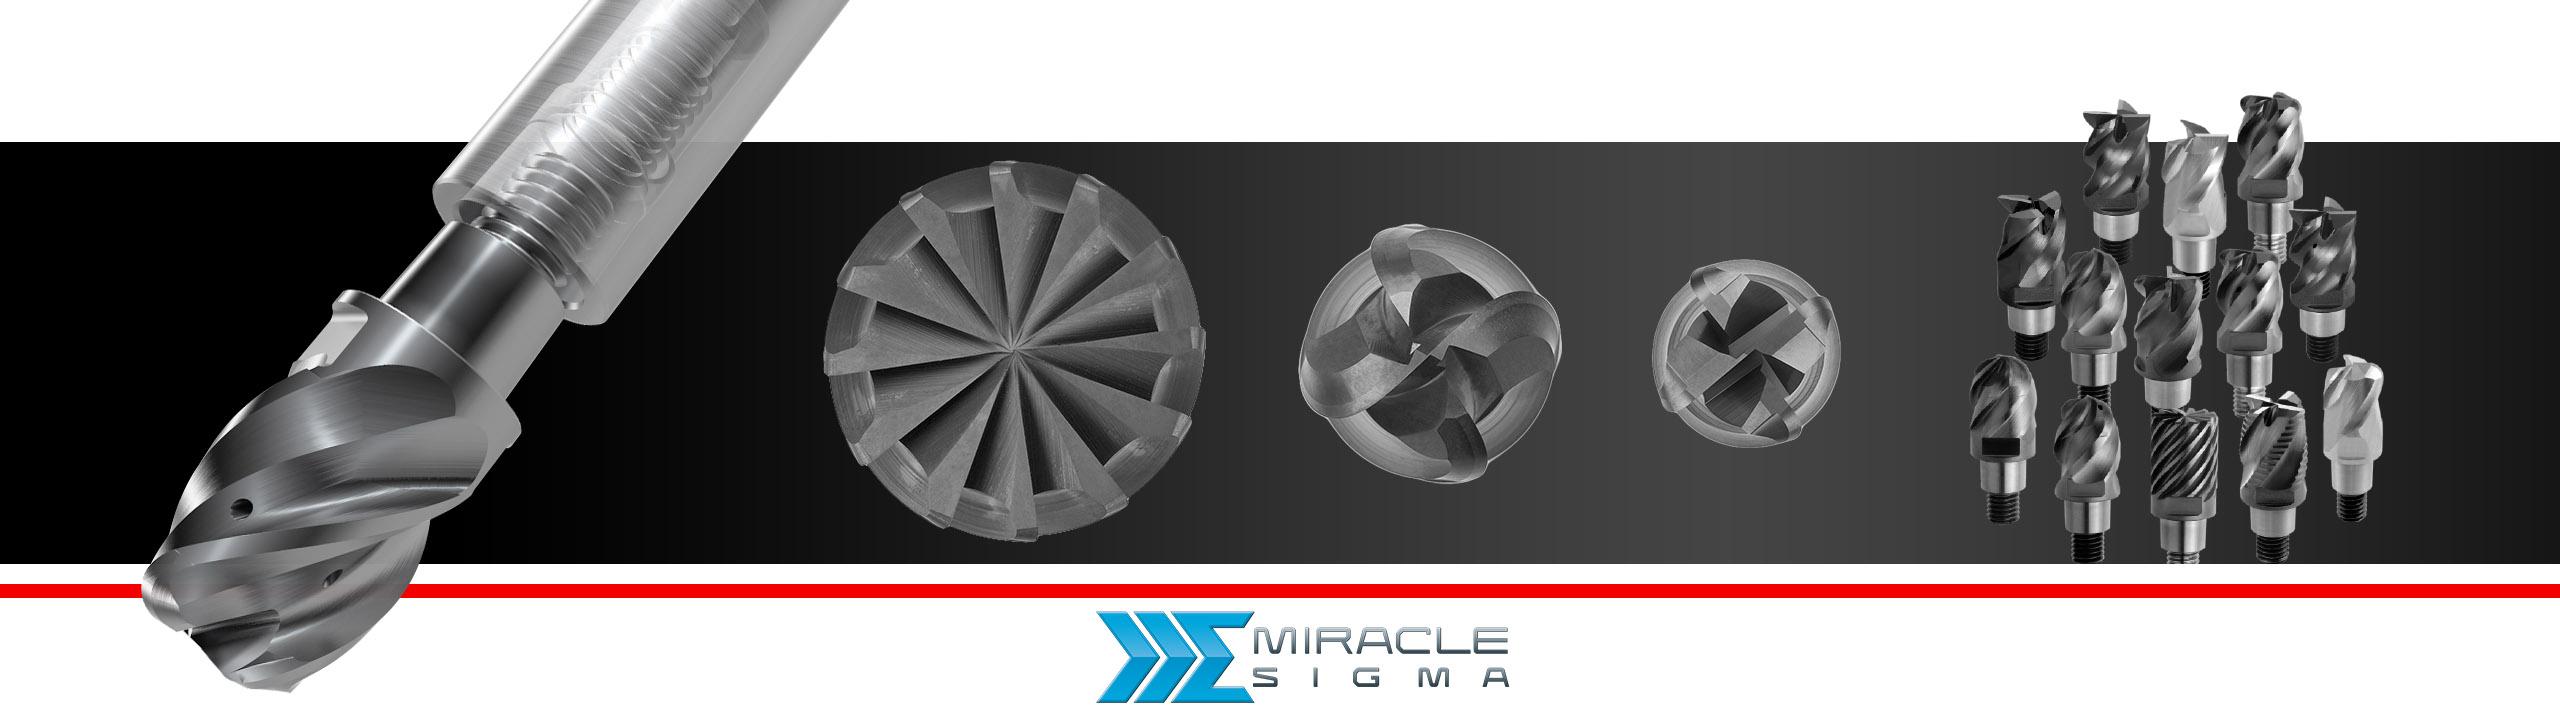 2 mm Corner Radius 4 mm Cutting Diameter 3 Flutes Mitsubishi Materials VF3XBR0200T0054L050 Carbide Impact Miracle Ball Nose End Mill Taper Neck 54 Taper Angle 50 mm LOC